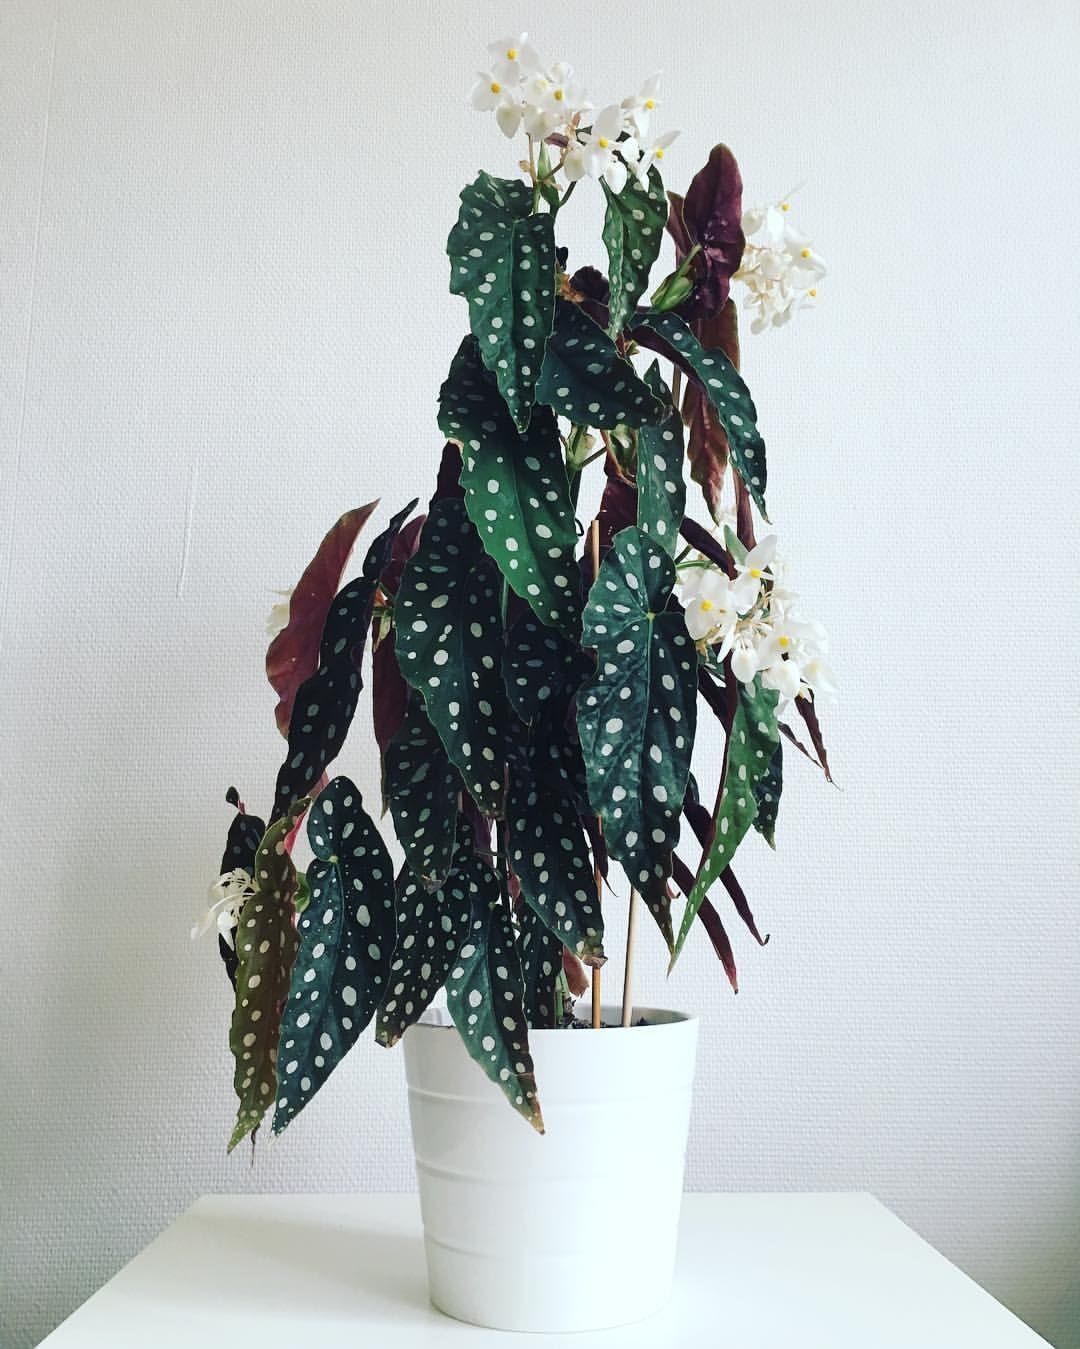 "- P L A N T A T I O M E A (@plantatiomea) on Instagram: ""I just love her! #prickbegonia #begoniamaculata #houseplantclub #polkadotbegonia #indoorplants…"""